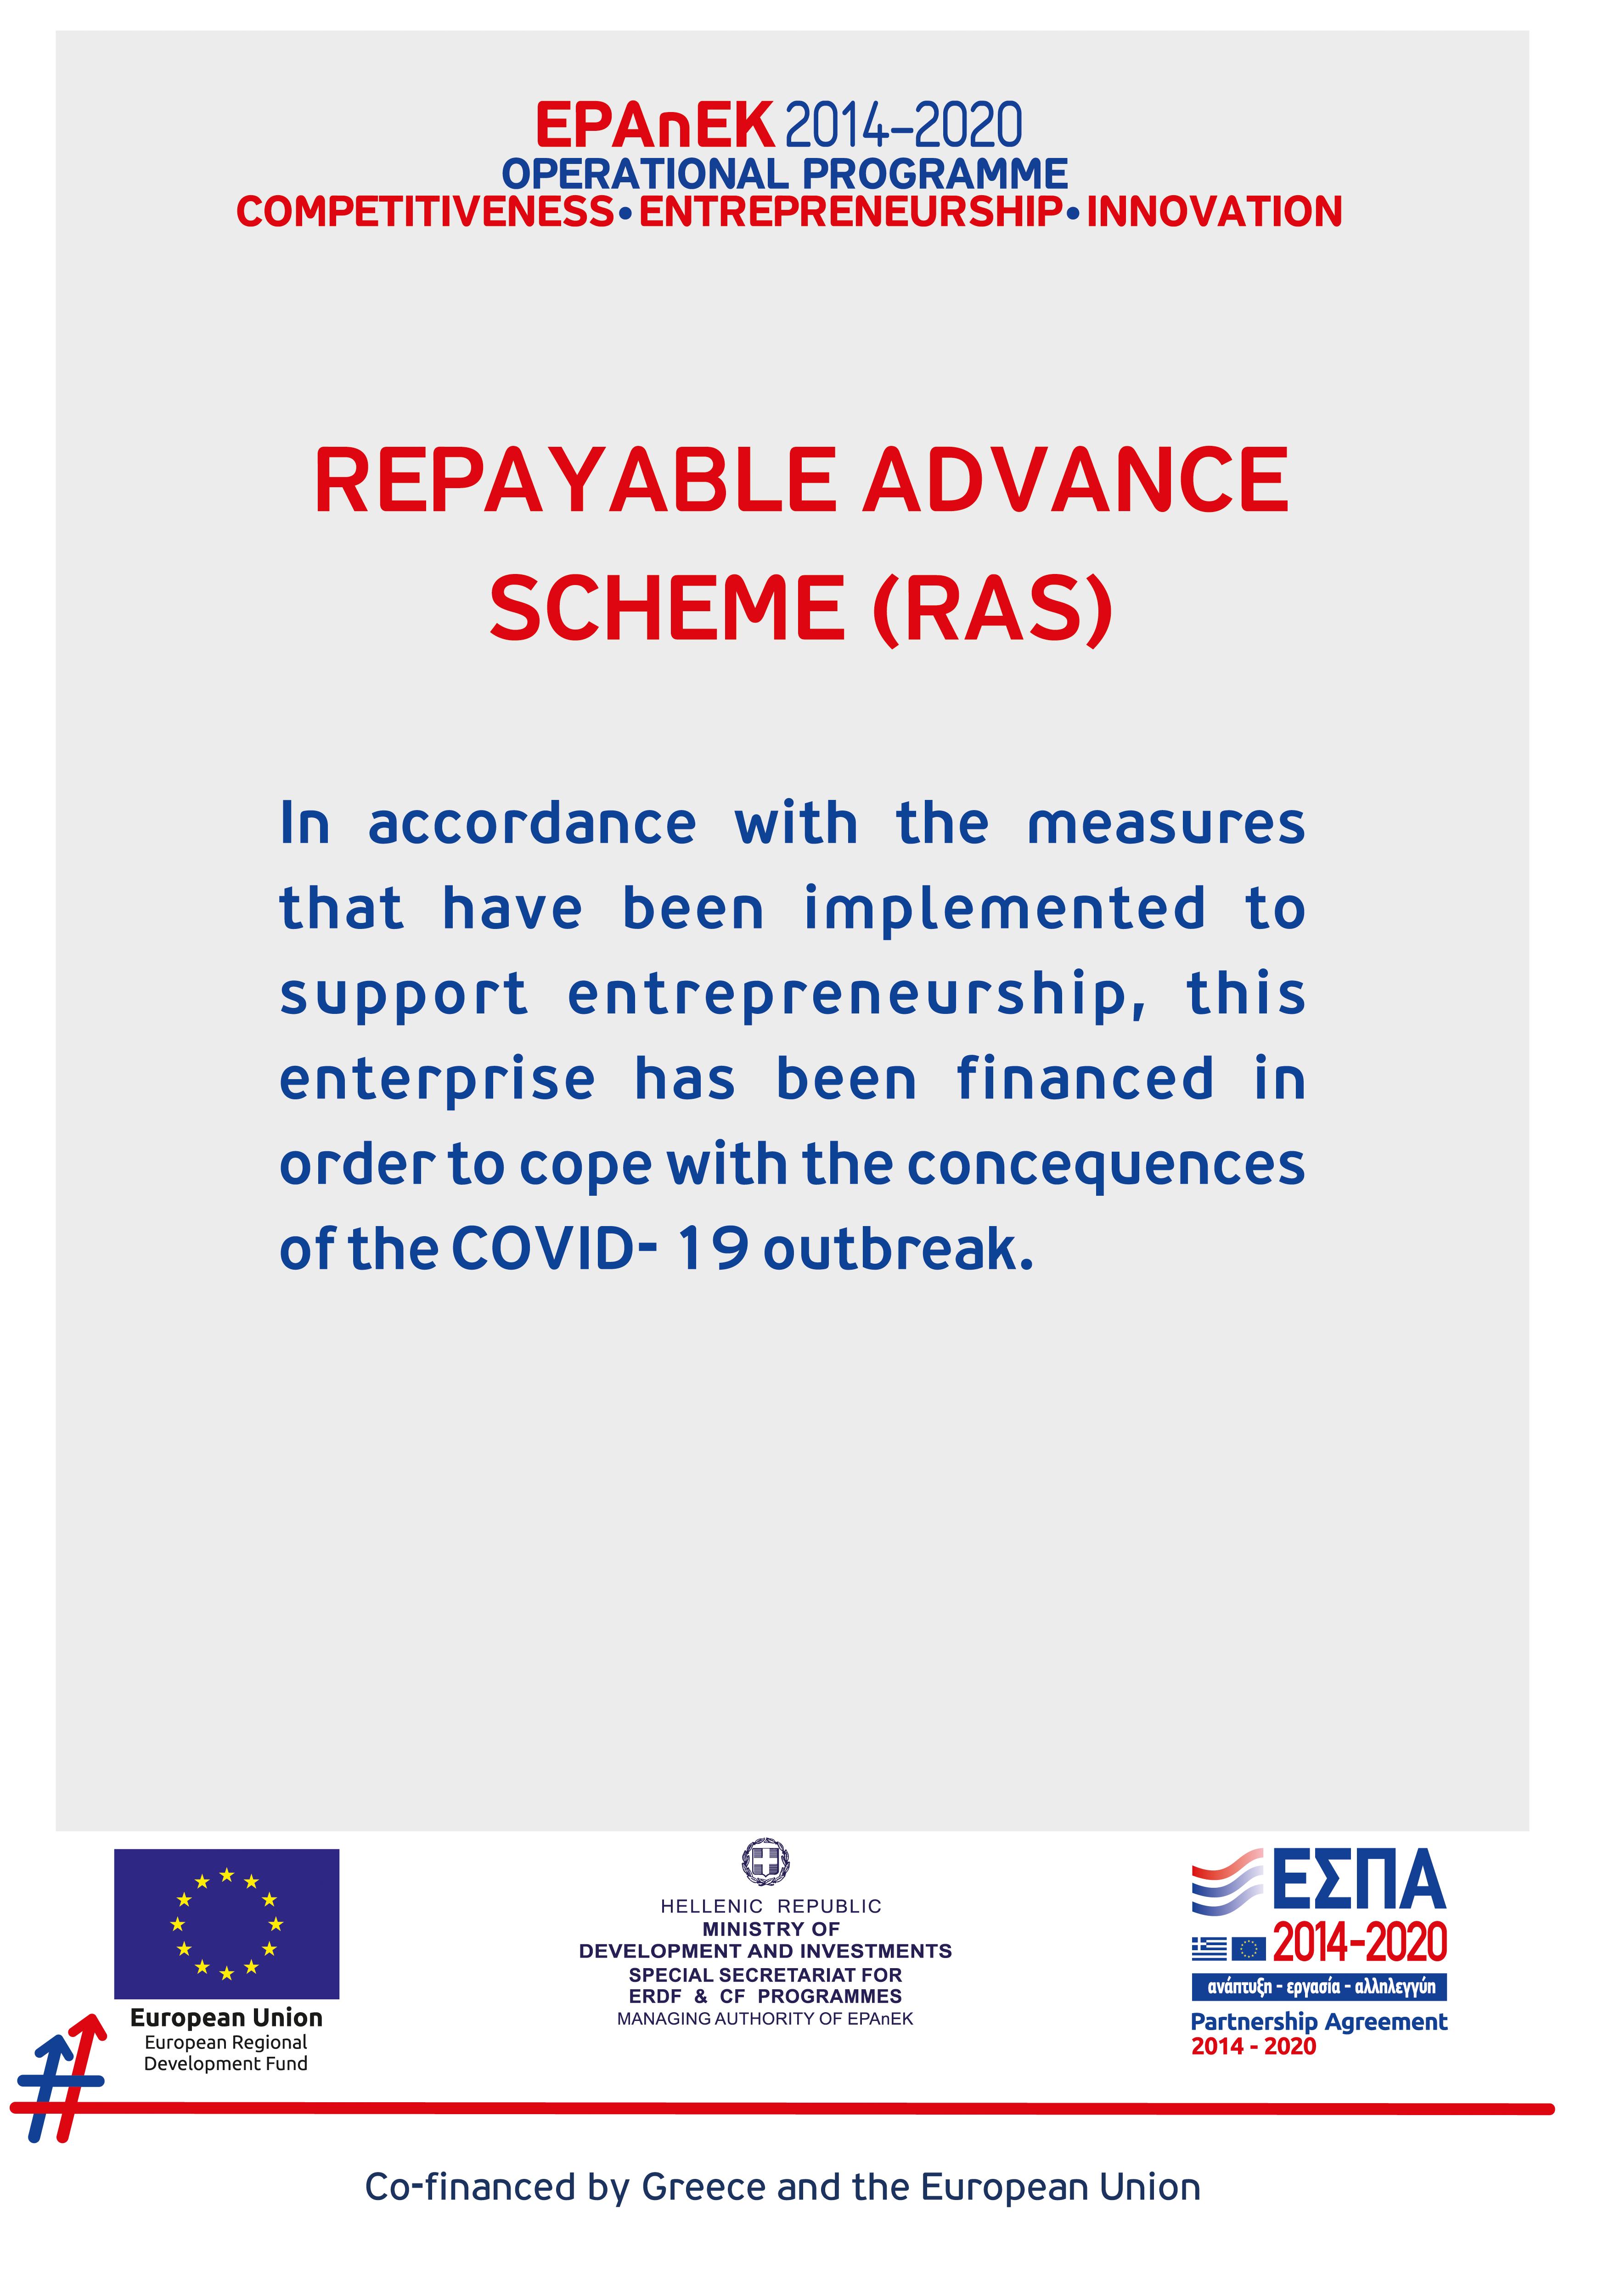 Repayable Advance Scheme RAS on Covid-19 support European Union Greece